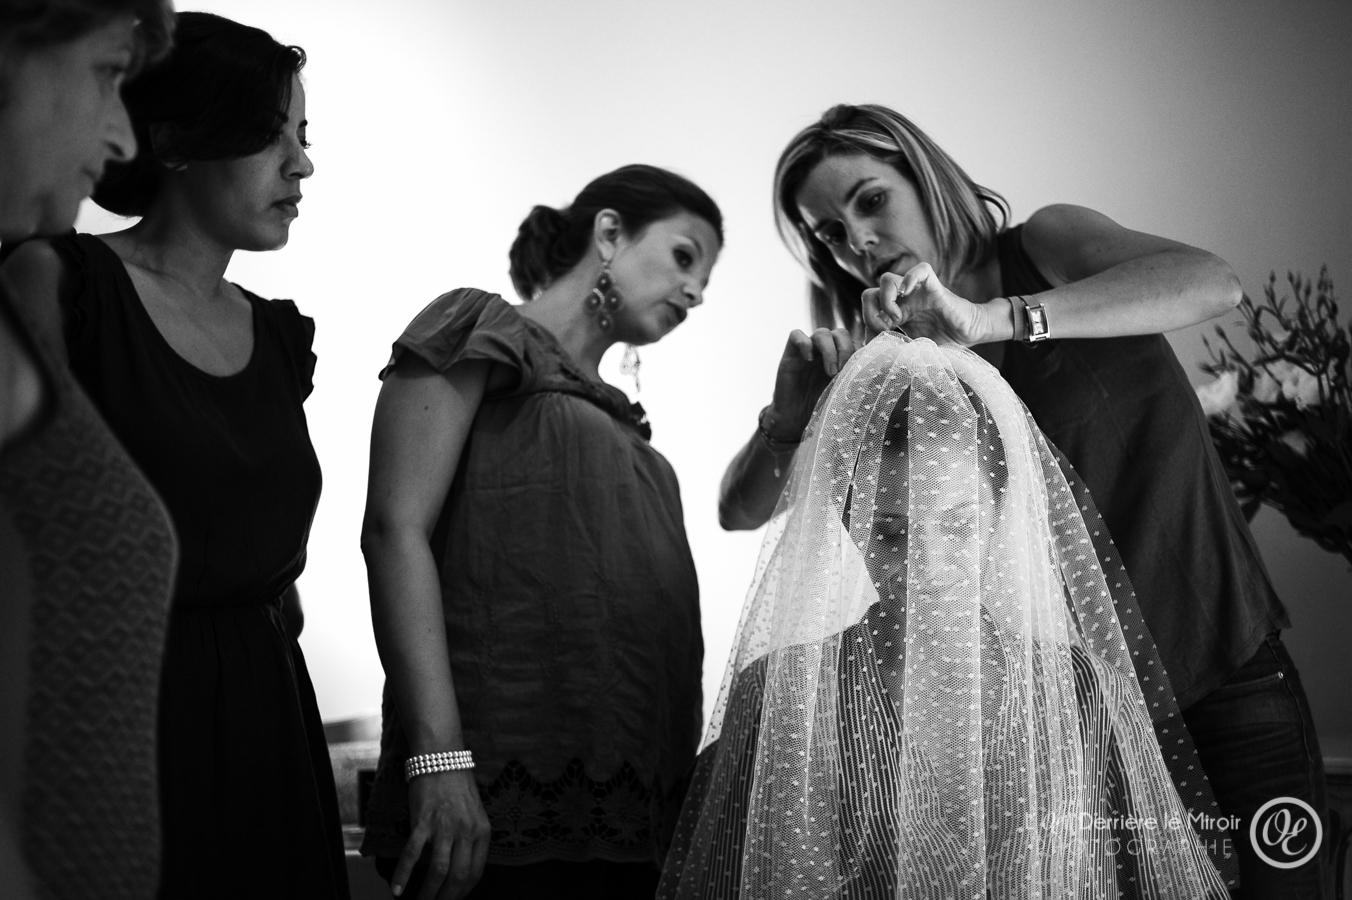 Photographe-Mariage-grasse-loeilderrierelemiroir-jt-041